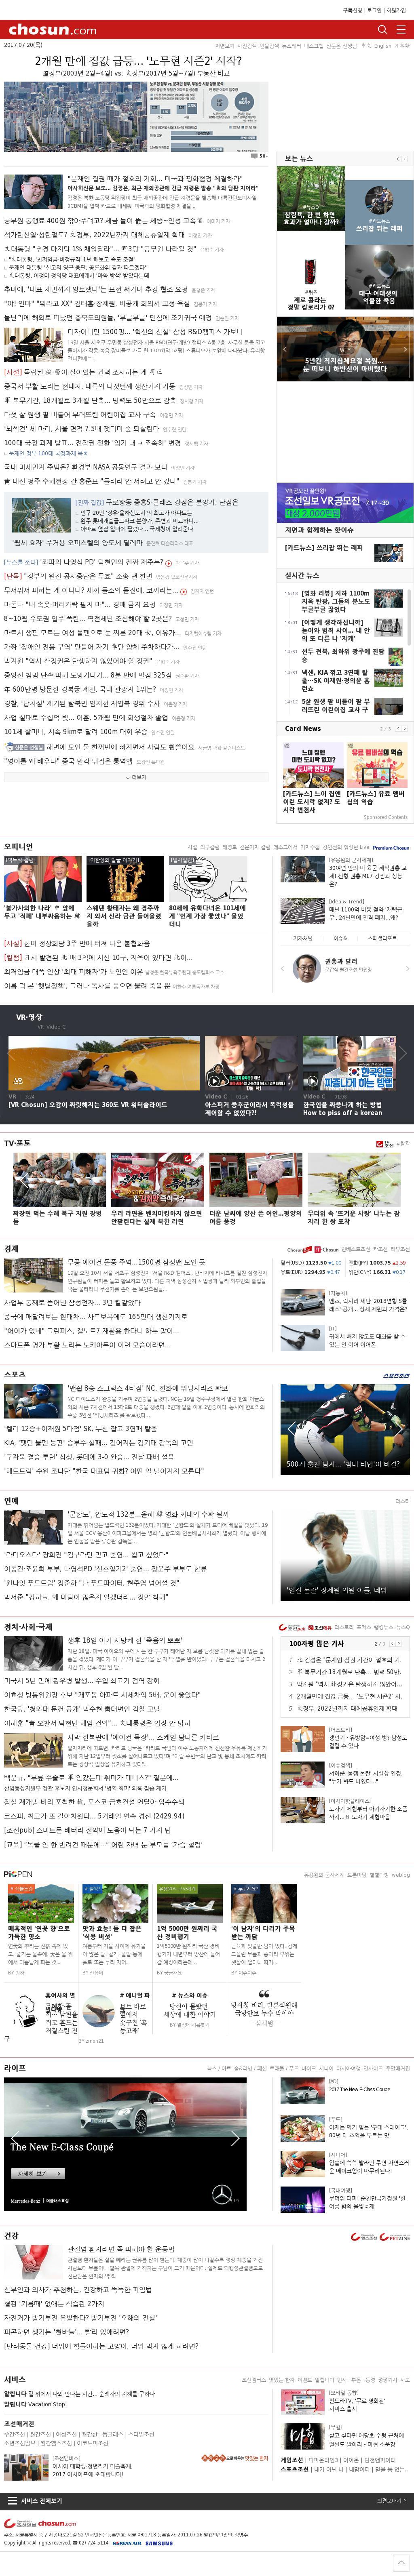 chosun.com at Wednesday July 19, 2017, 6:02 p.m. UTC